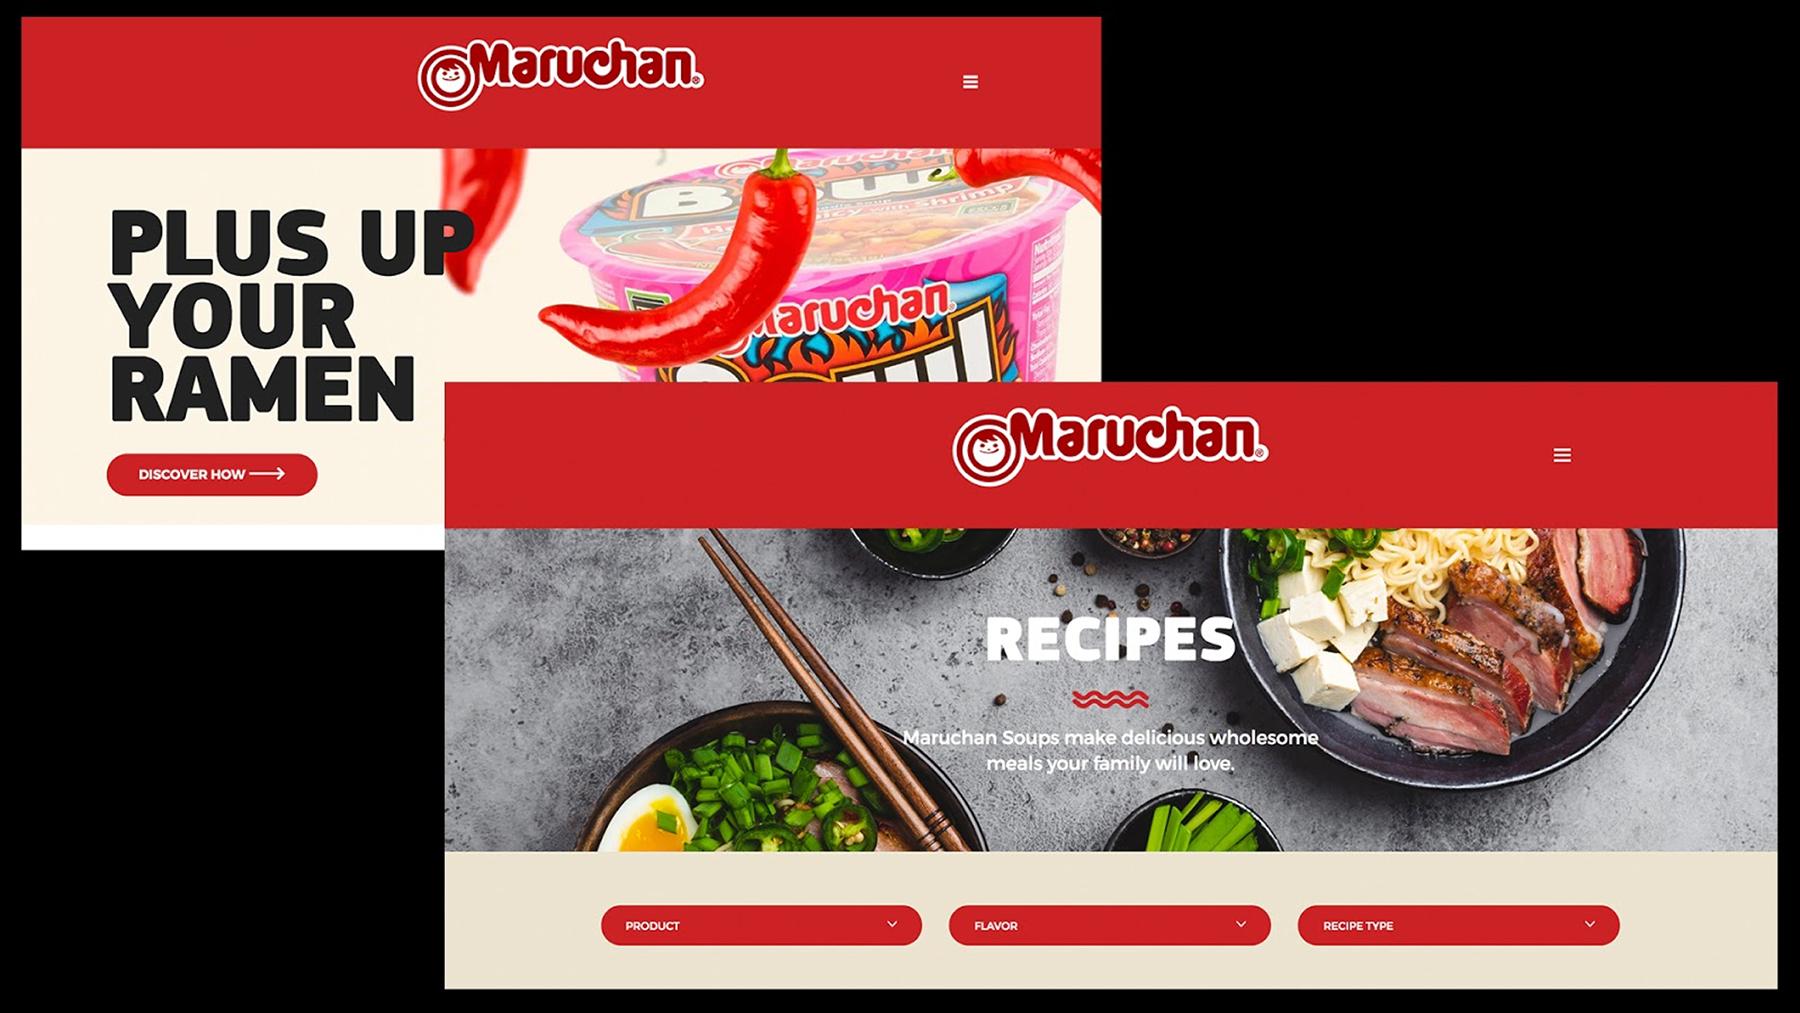 LaunchedaNewMaruchan